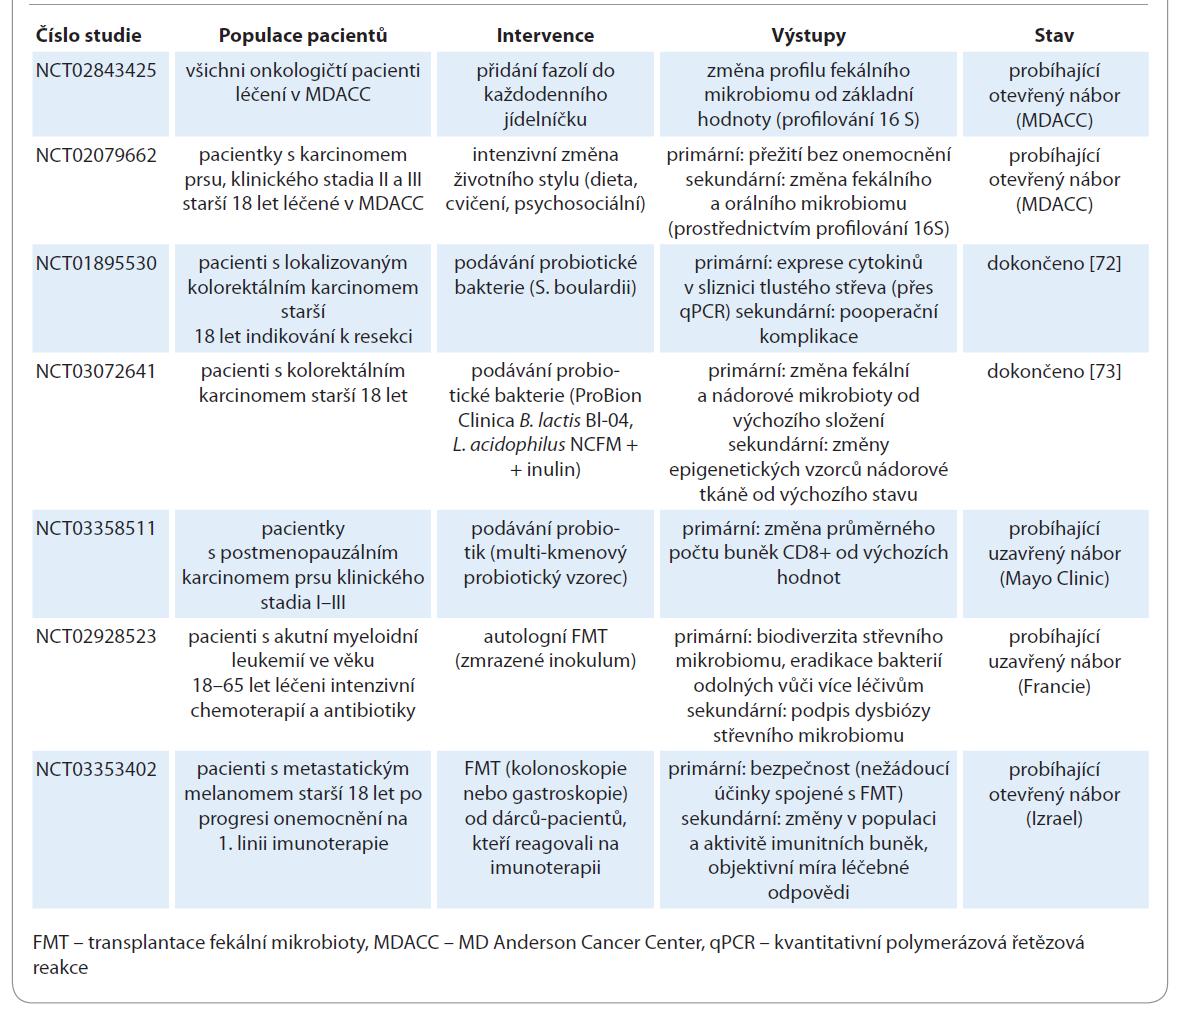 Modulace mikrobiomu – klinické studie.